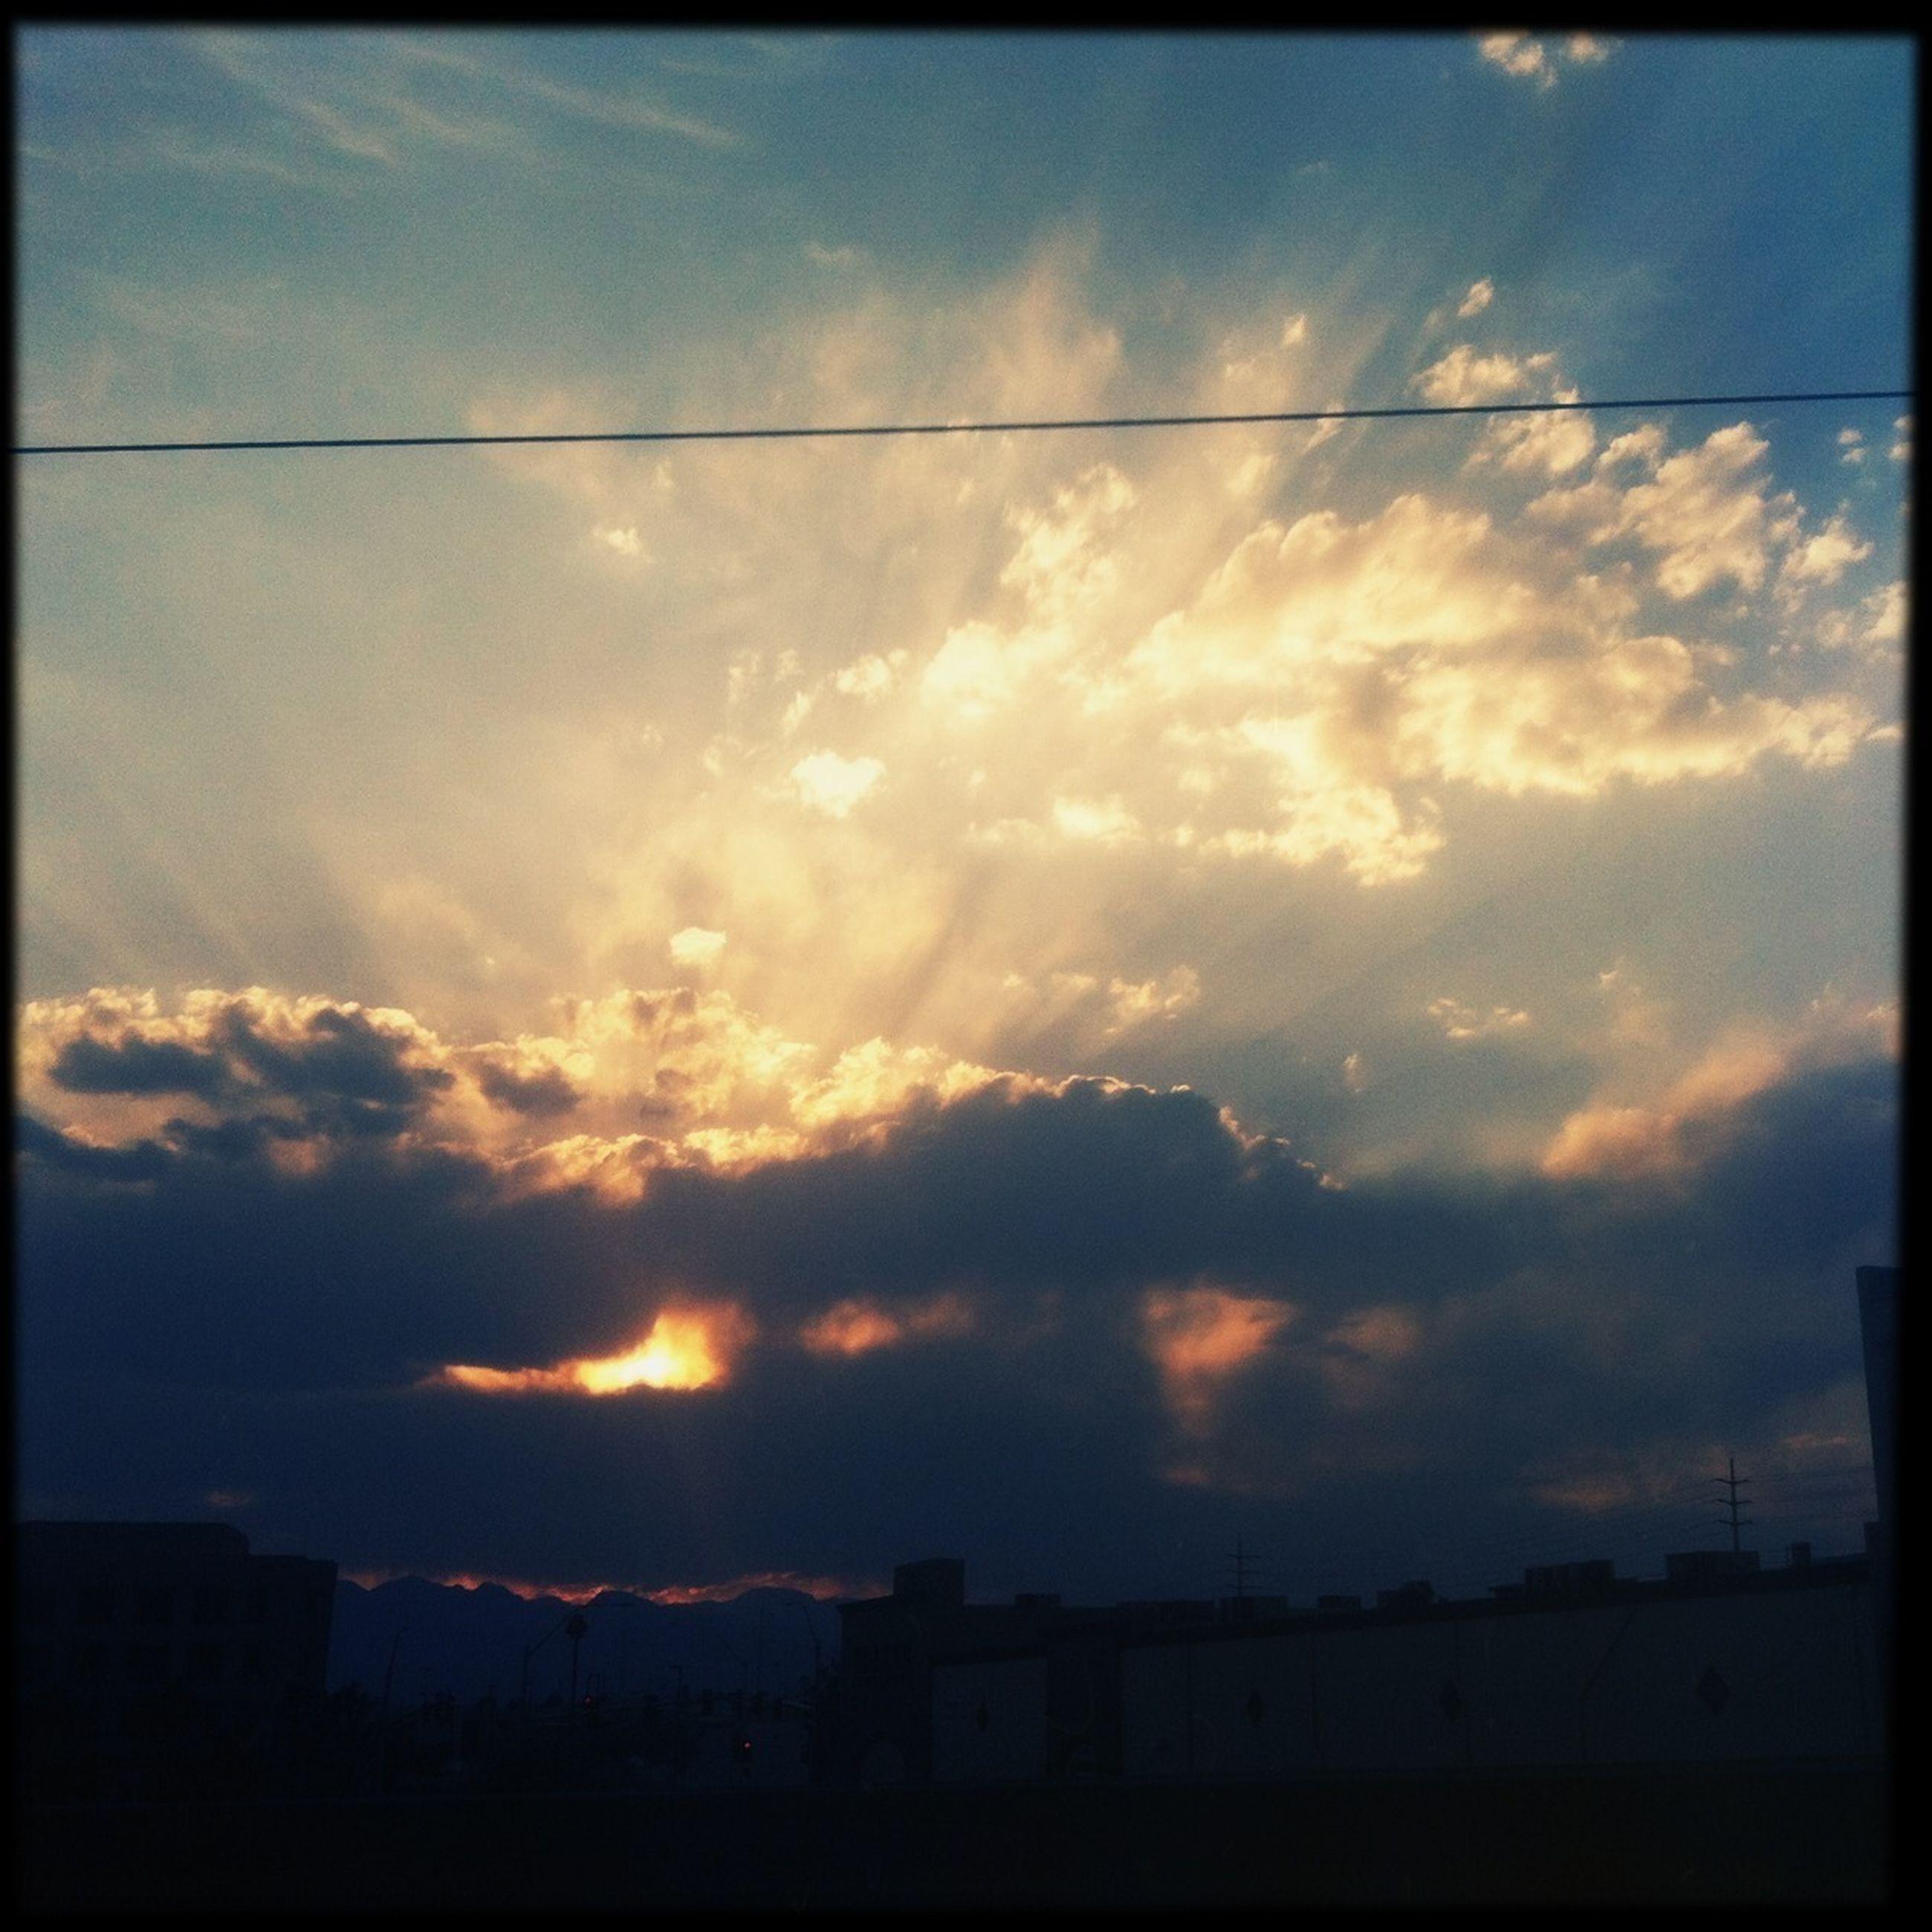 sunset, sky, silhouette, building exterior, cloud - sky, architecture, built structure, transfer print, cloud, power line, orange color, beauty in nature, city, auto post production filter, cloudy, nature, scenics, sunlight, electricity pylon, sun